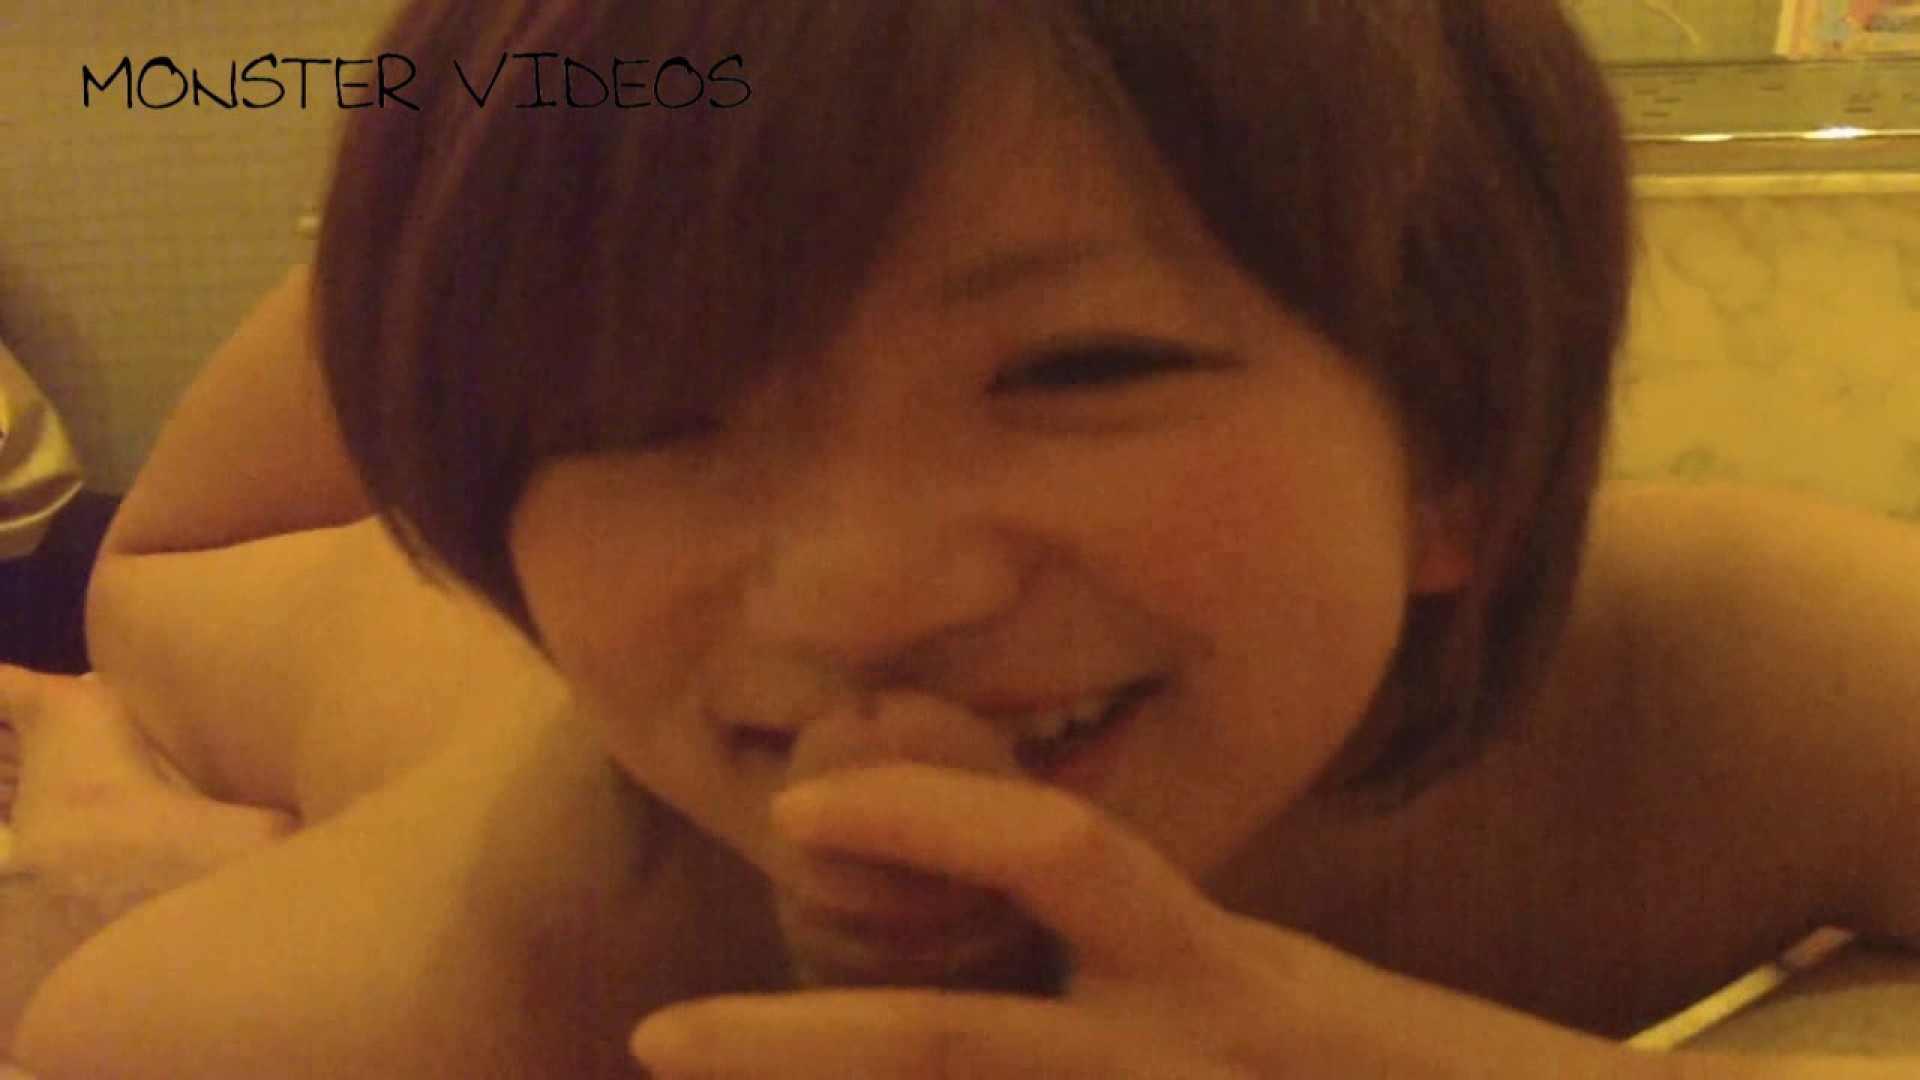 Hana嬢Private sexシリーズvol.1-2フェラ/挿入編 OL  58pic 23